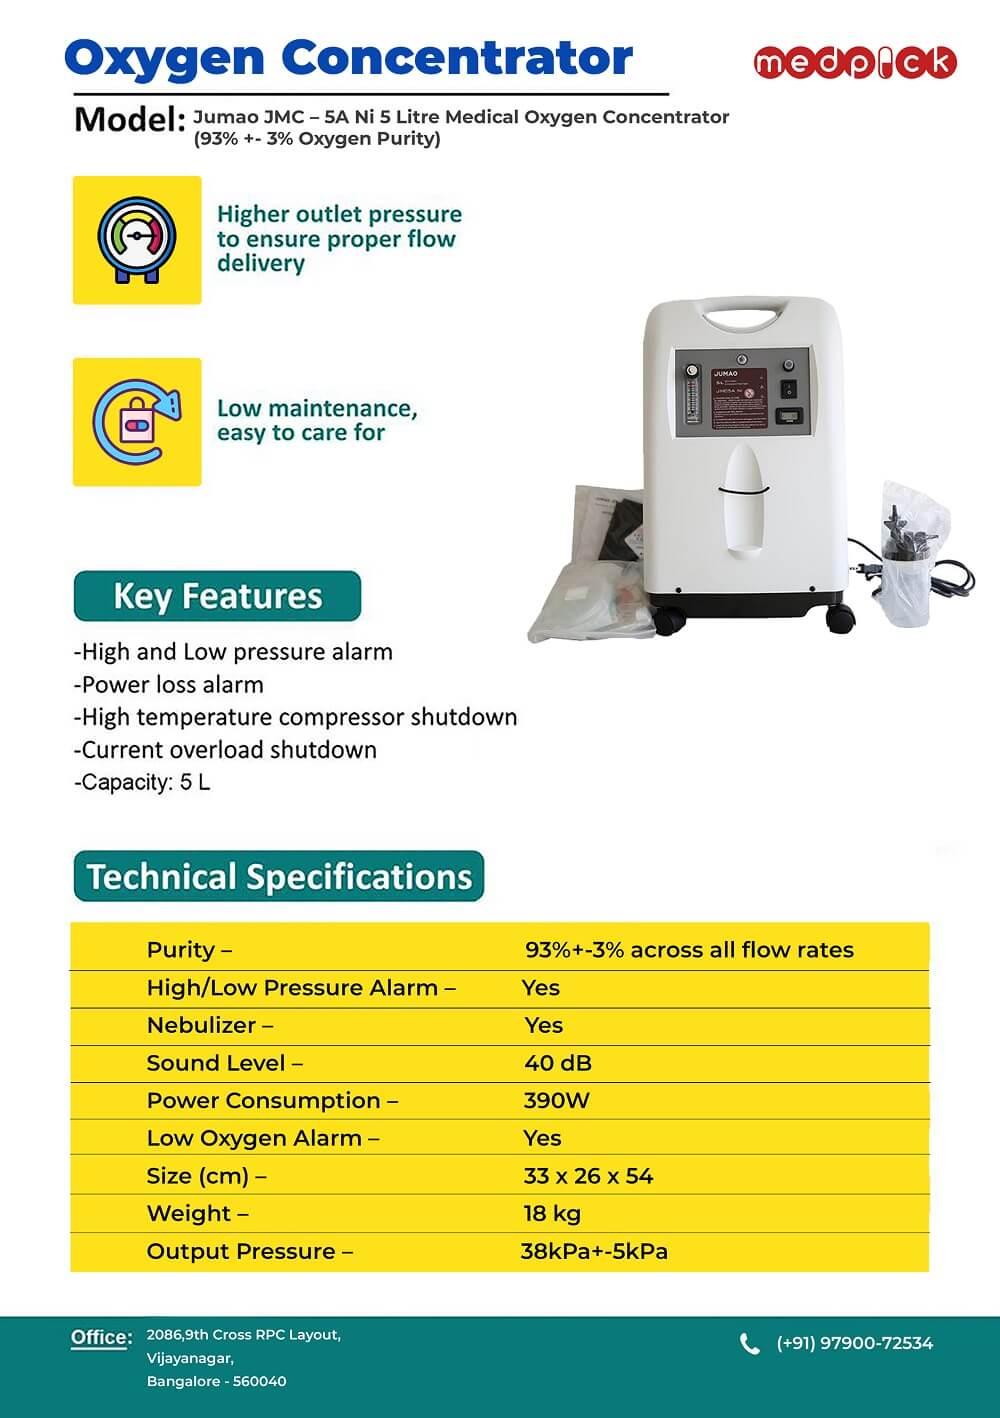 Jumao JMC – 5A Ni 5 Litre Medical Oxygen Concentrator (93% +- 3% Oxygen Purity)